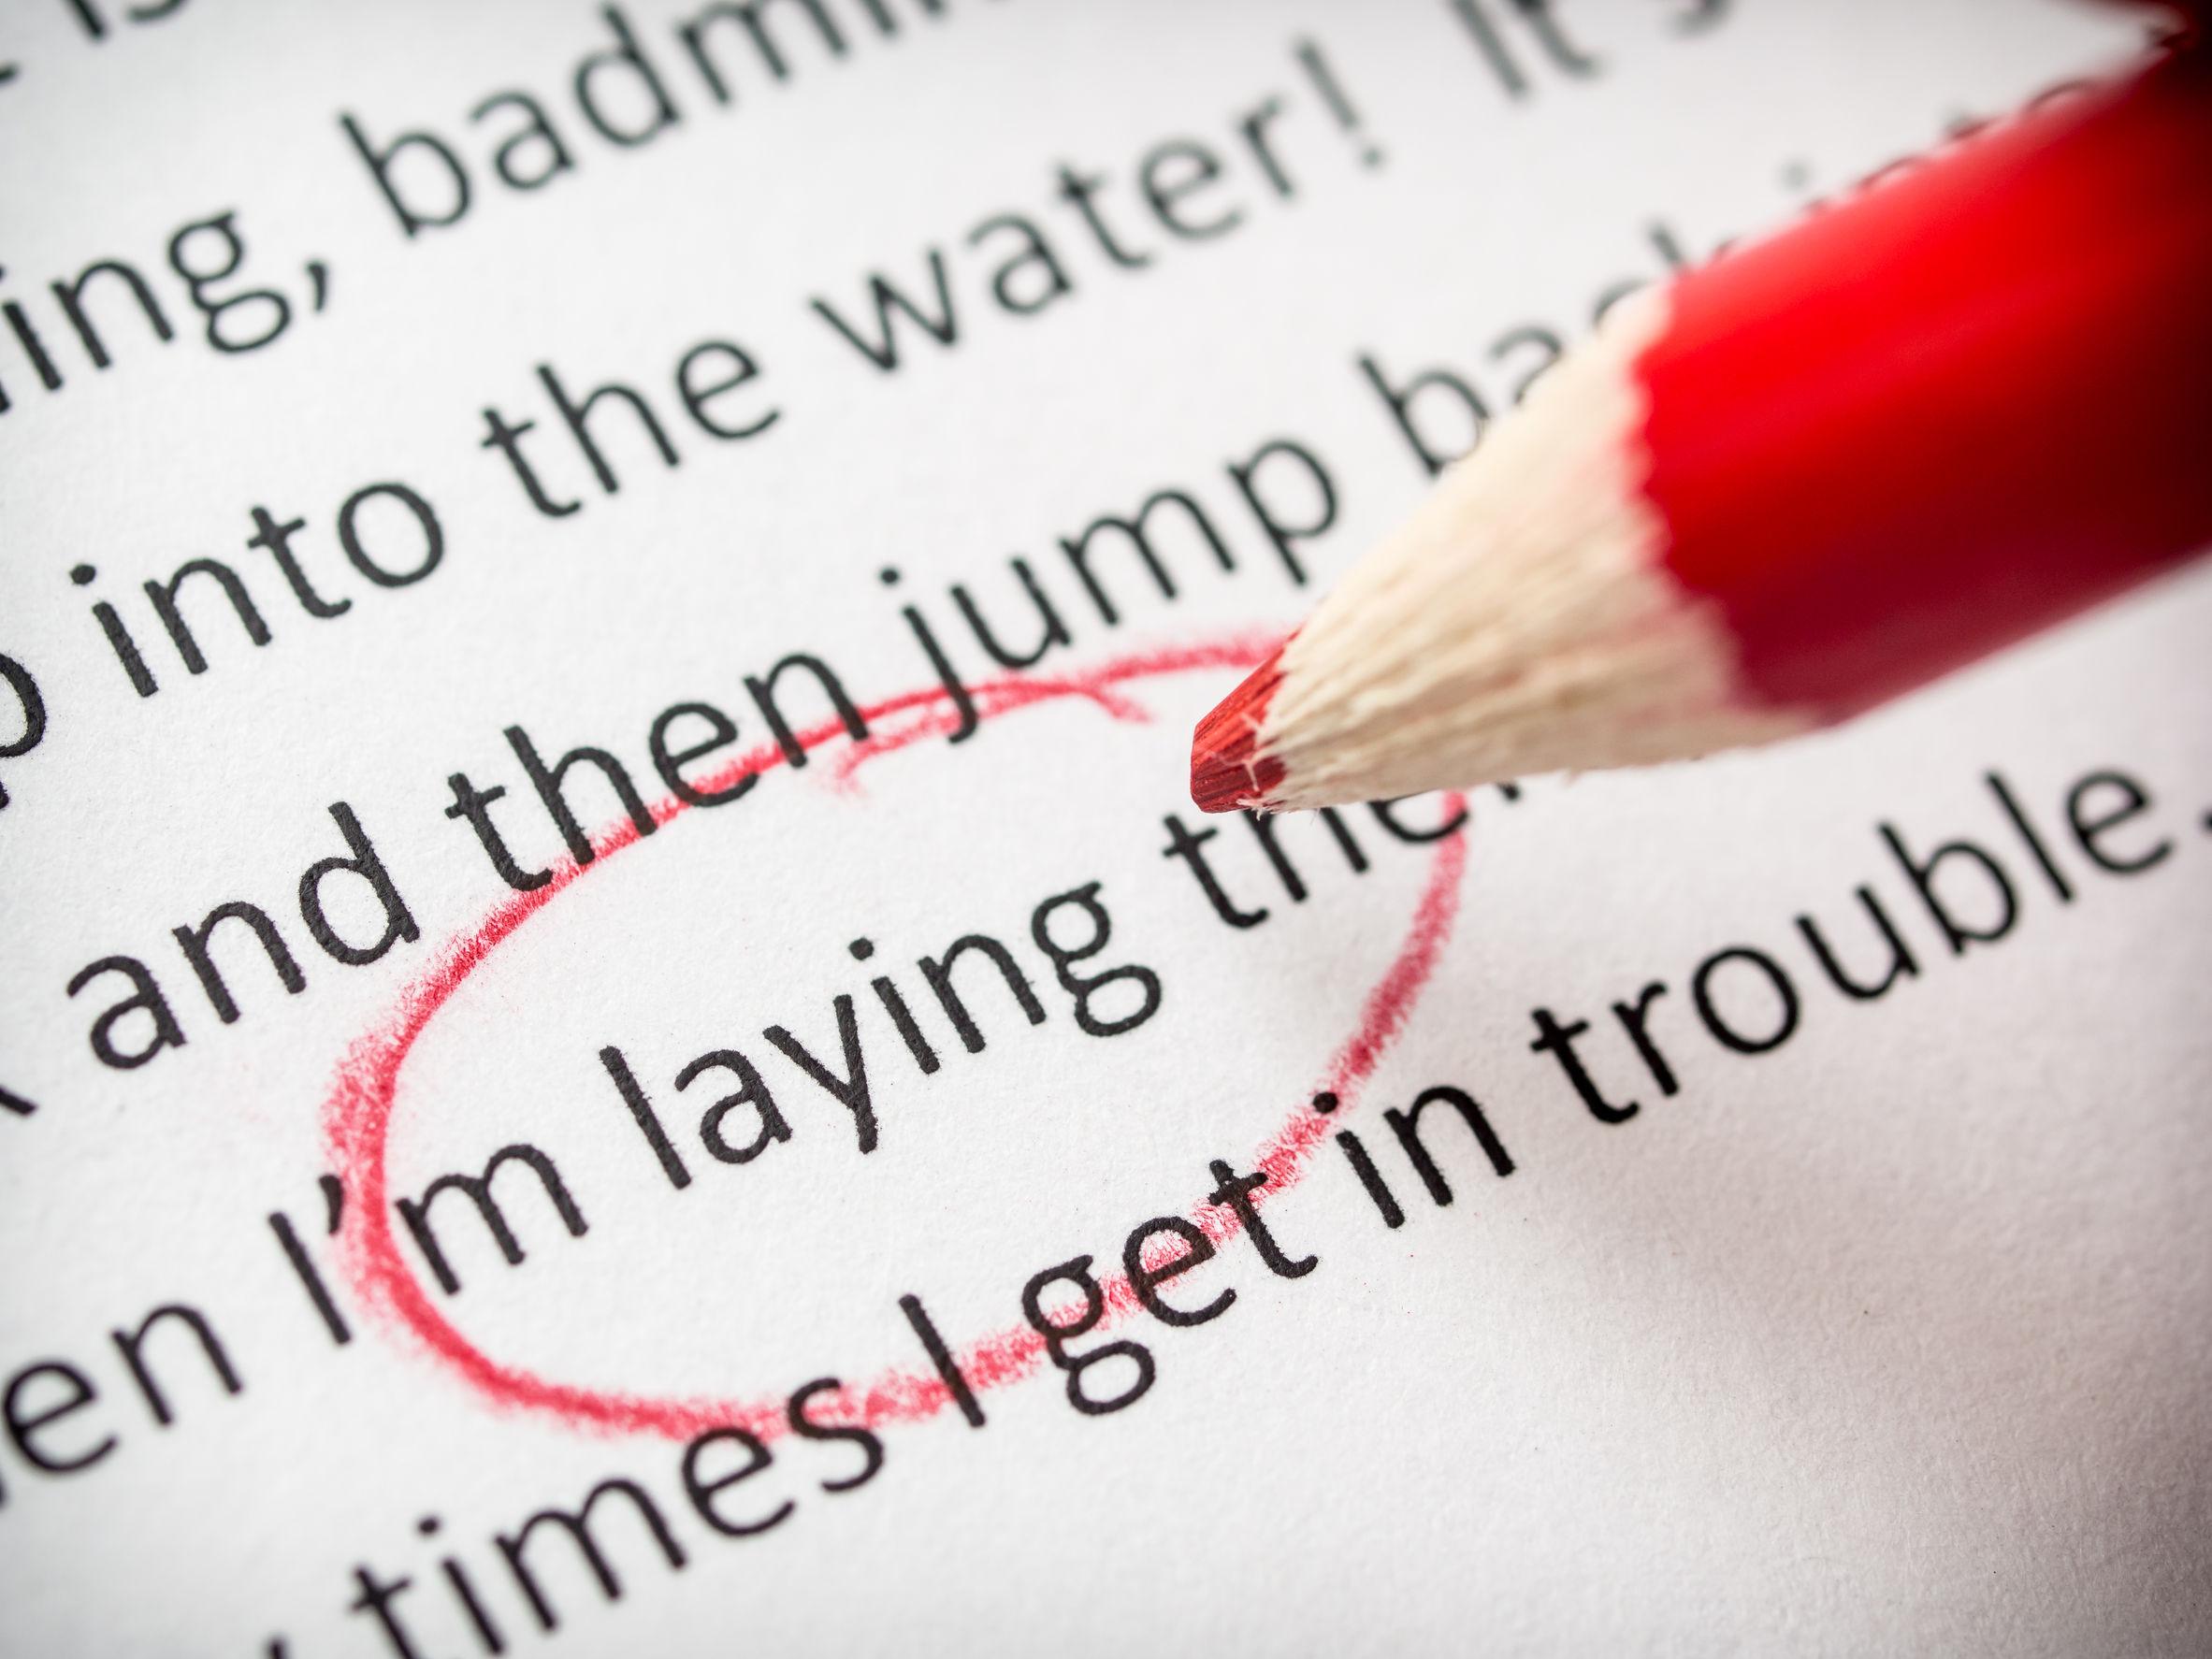 Does Bad Grammar Instruction Make Writing Worse